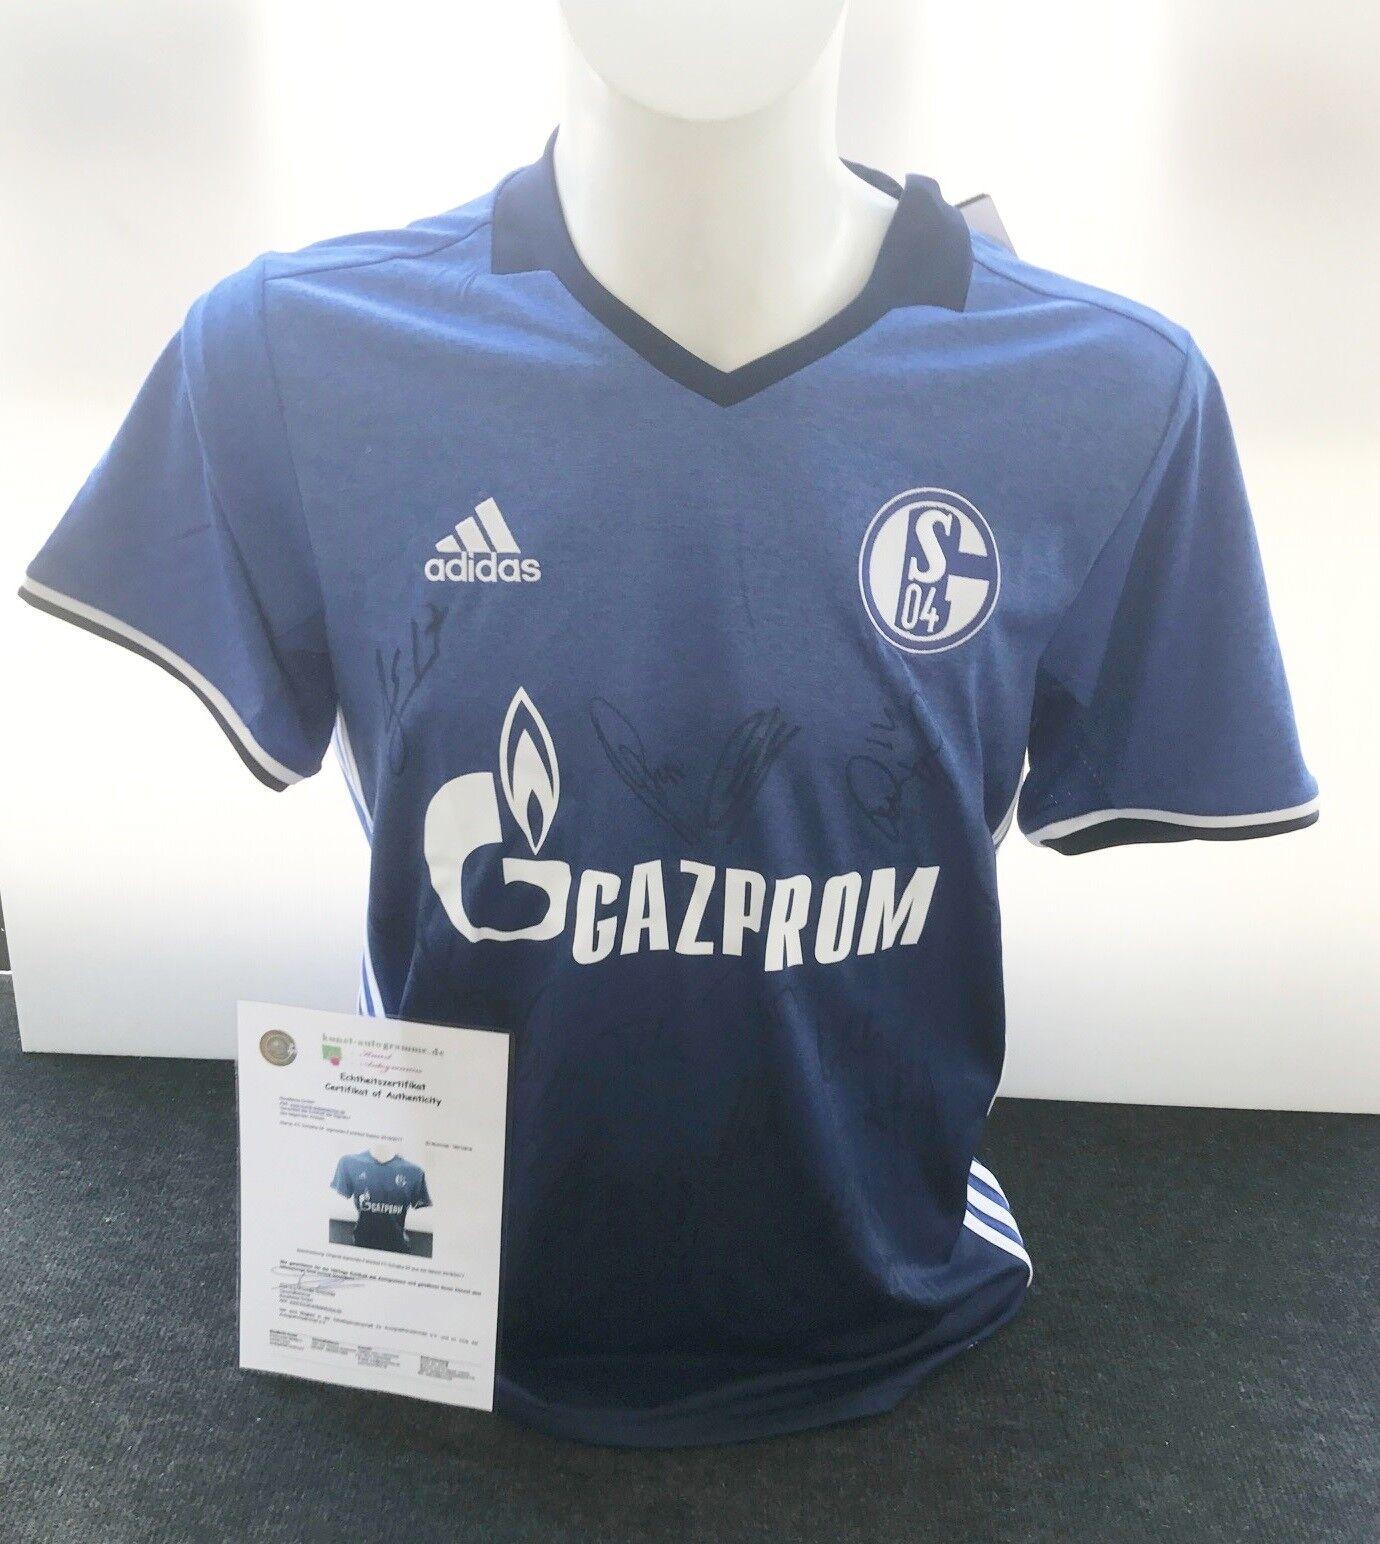 FC Schalke 04 Trikot 2016 2017, Teamsigniert, S04, gr. M